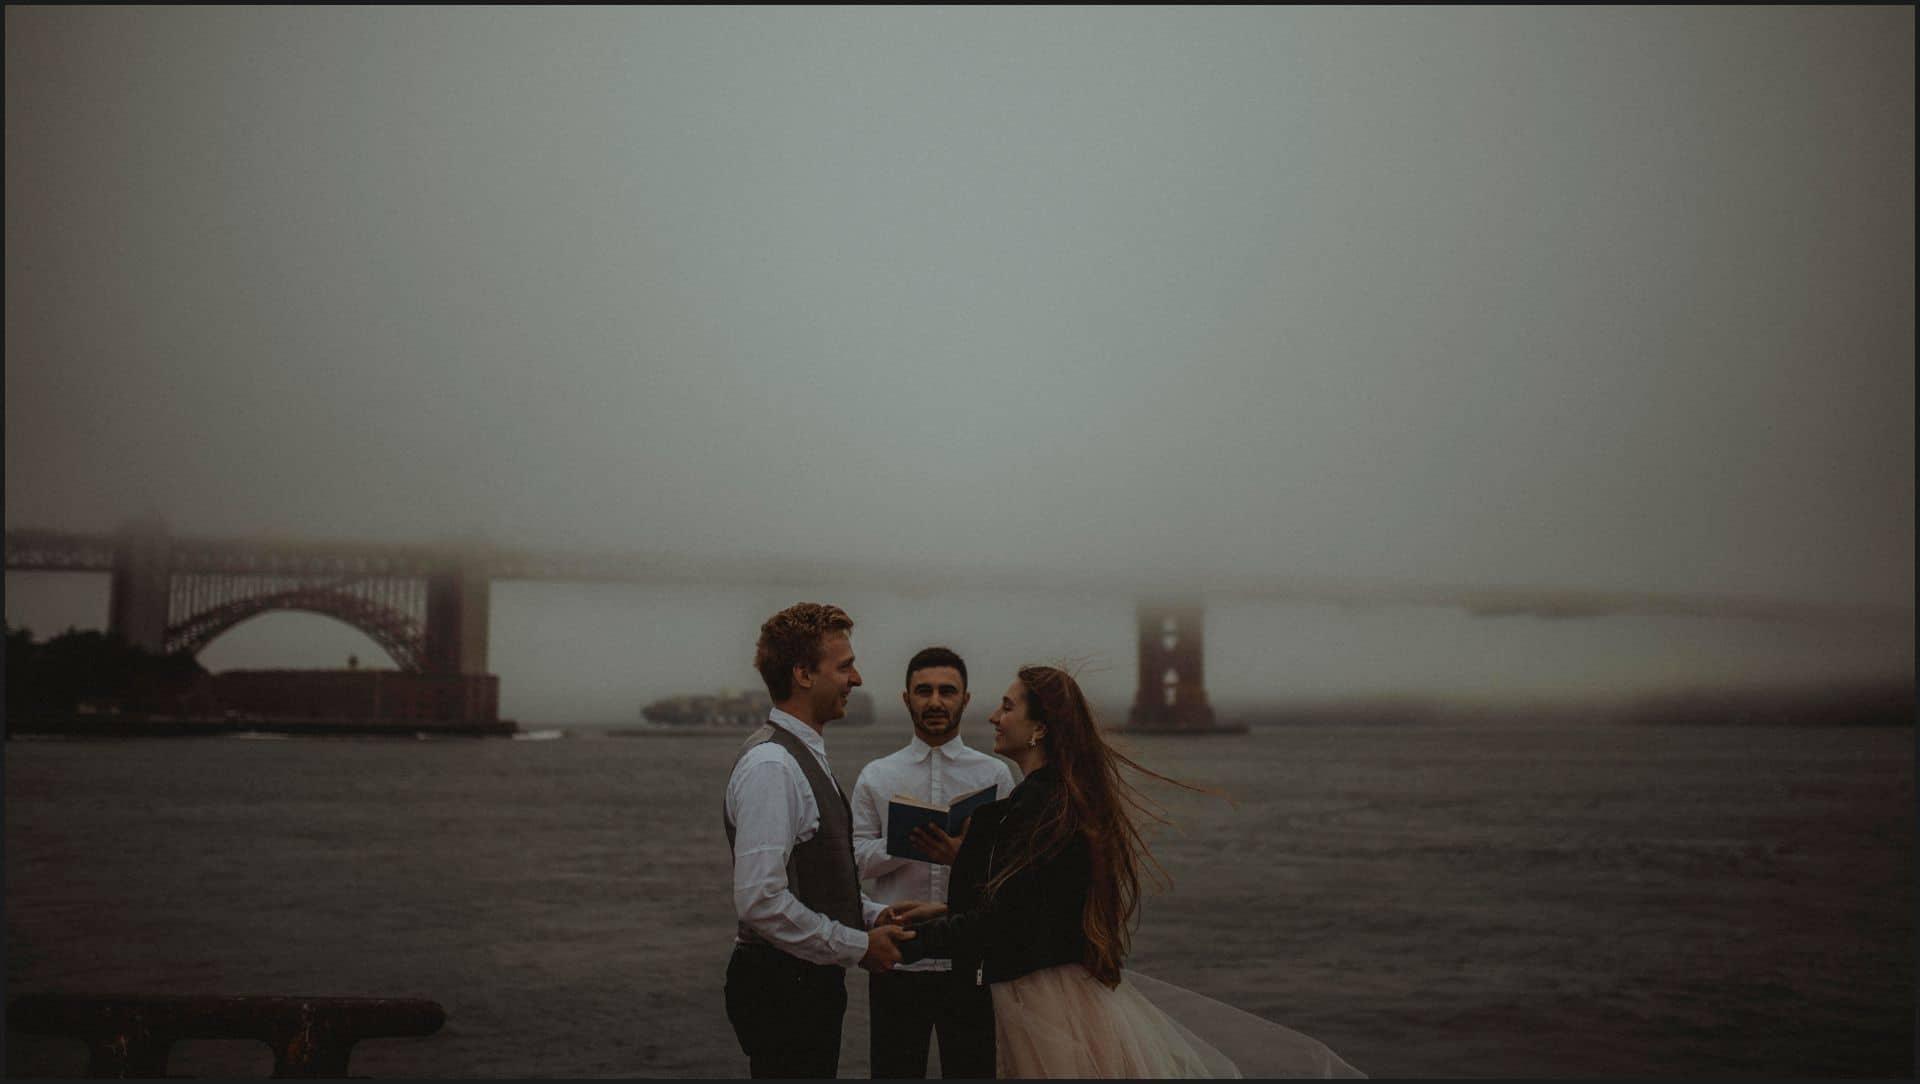 san francisco, california, elopement wedding, ocean, fog, wedding ceremony